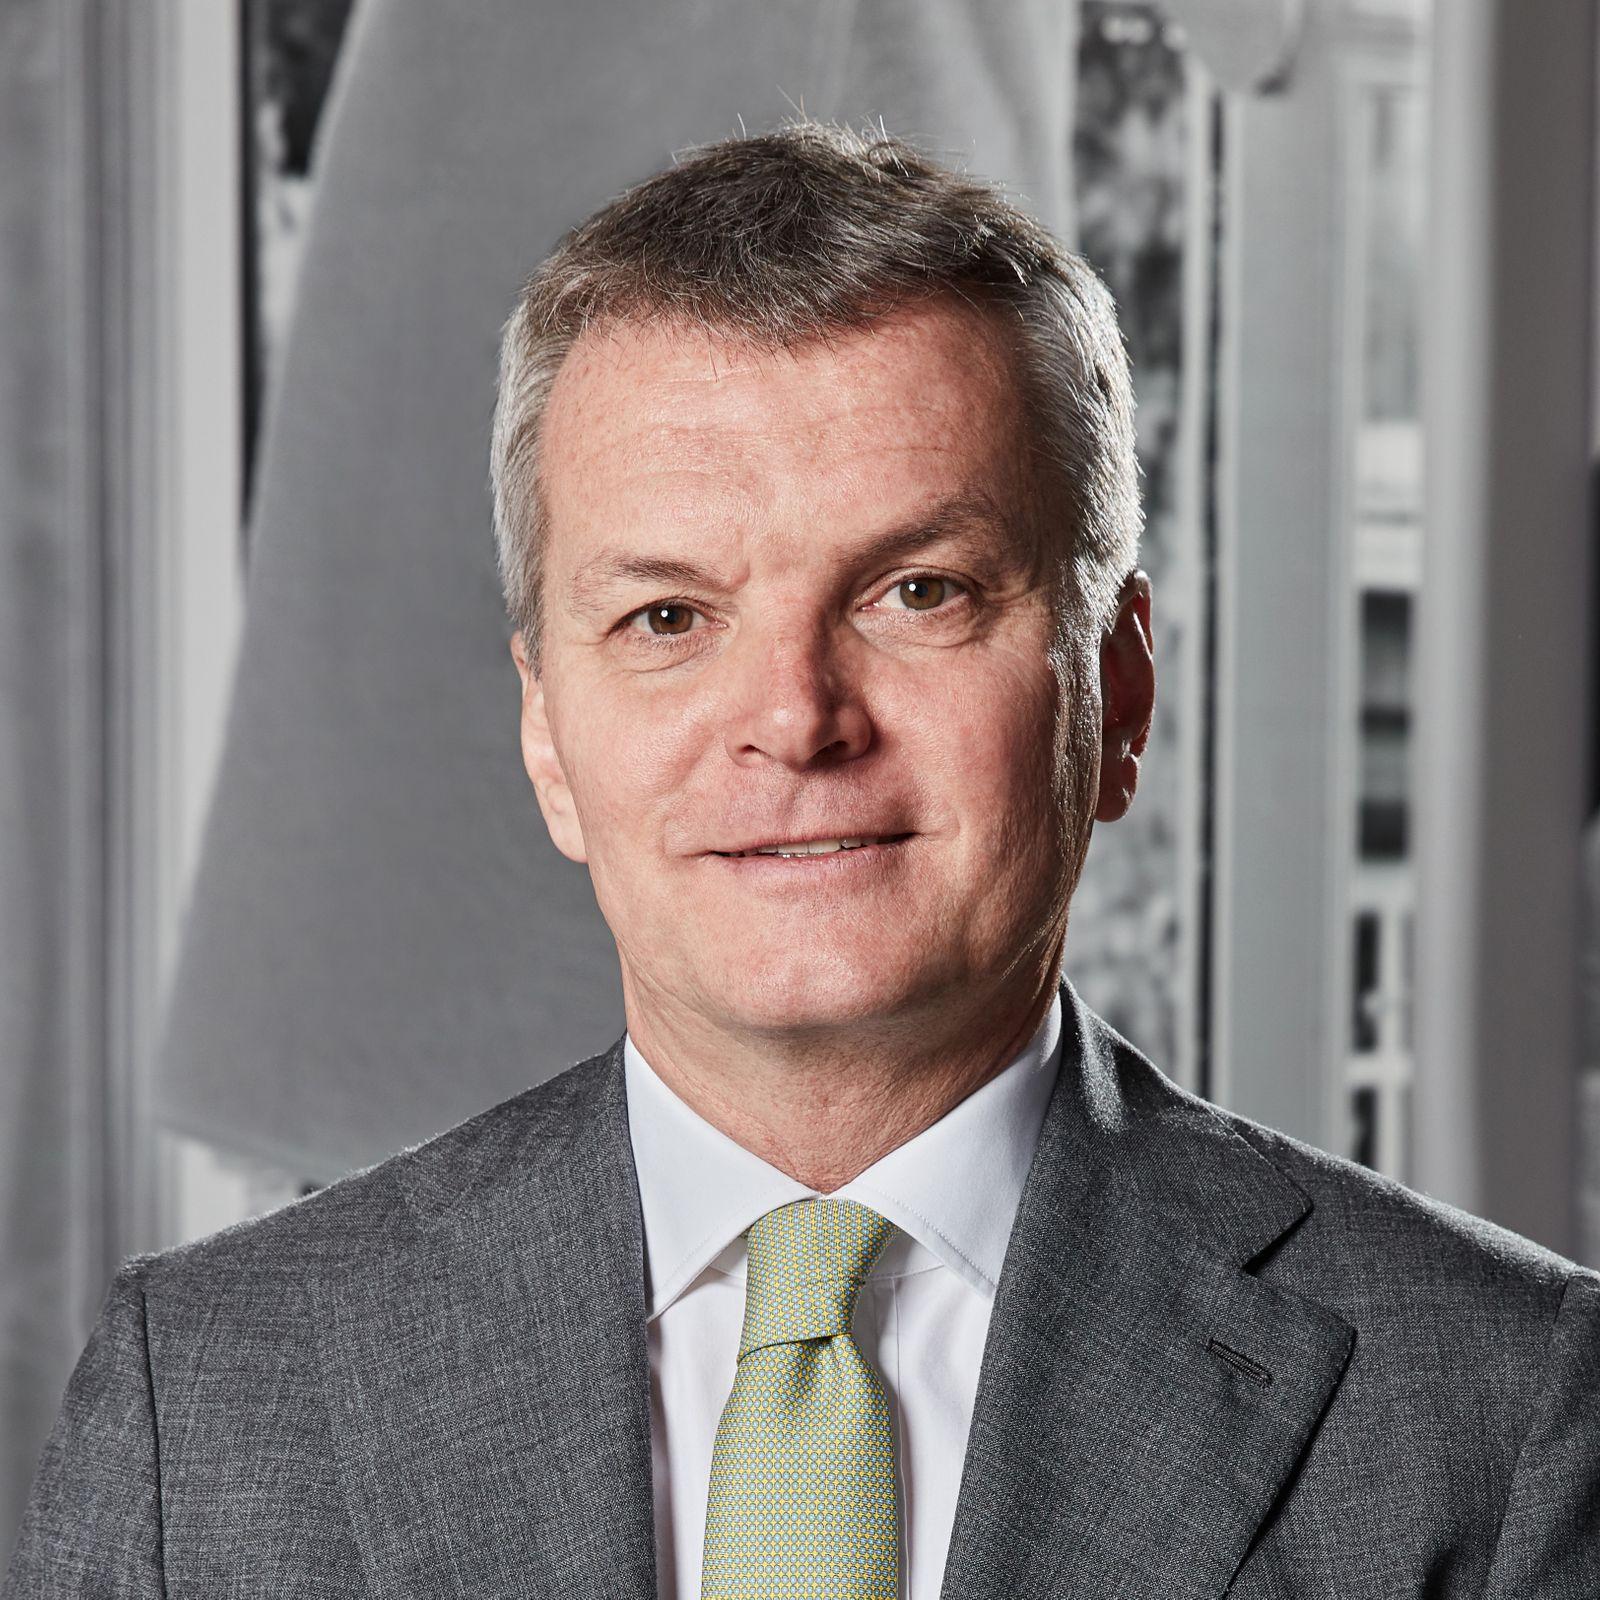 Filippo_Arnaboldi_-_CEO_-_Hi-Res